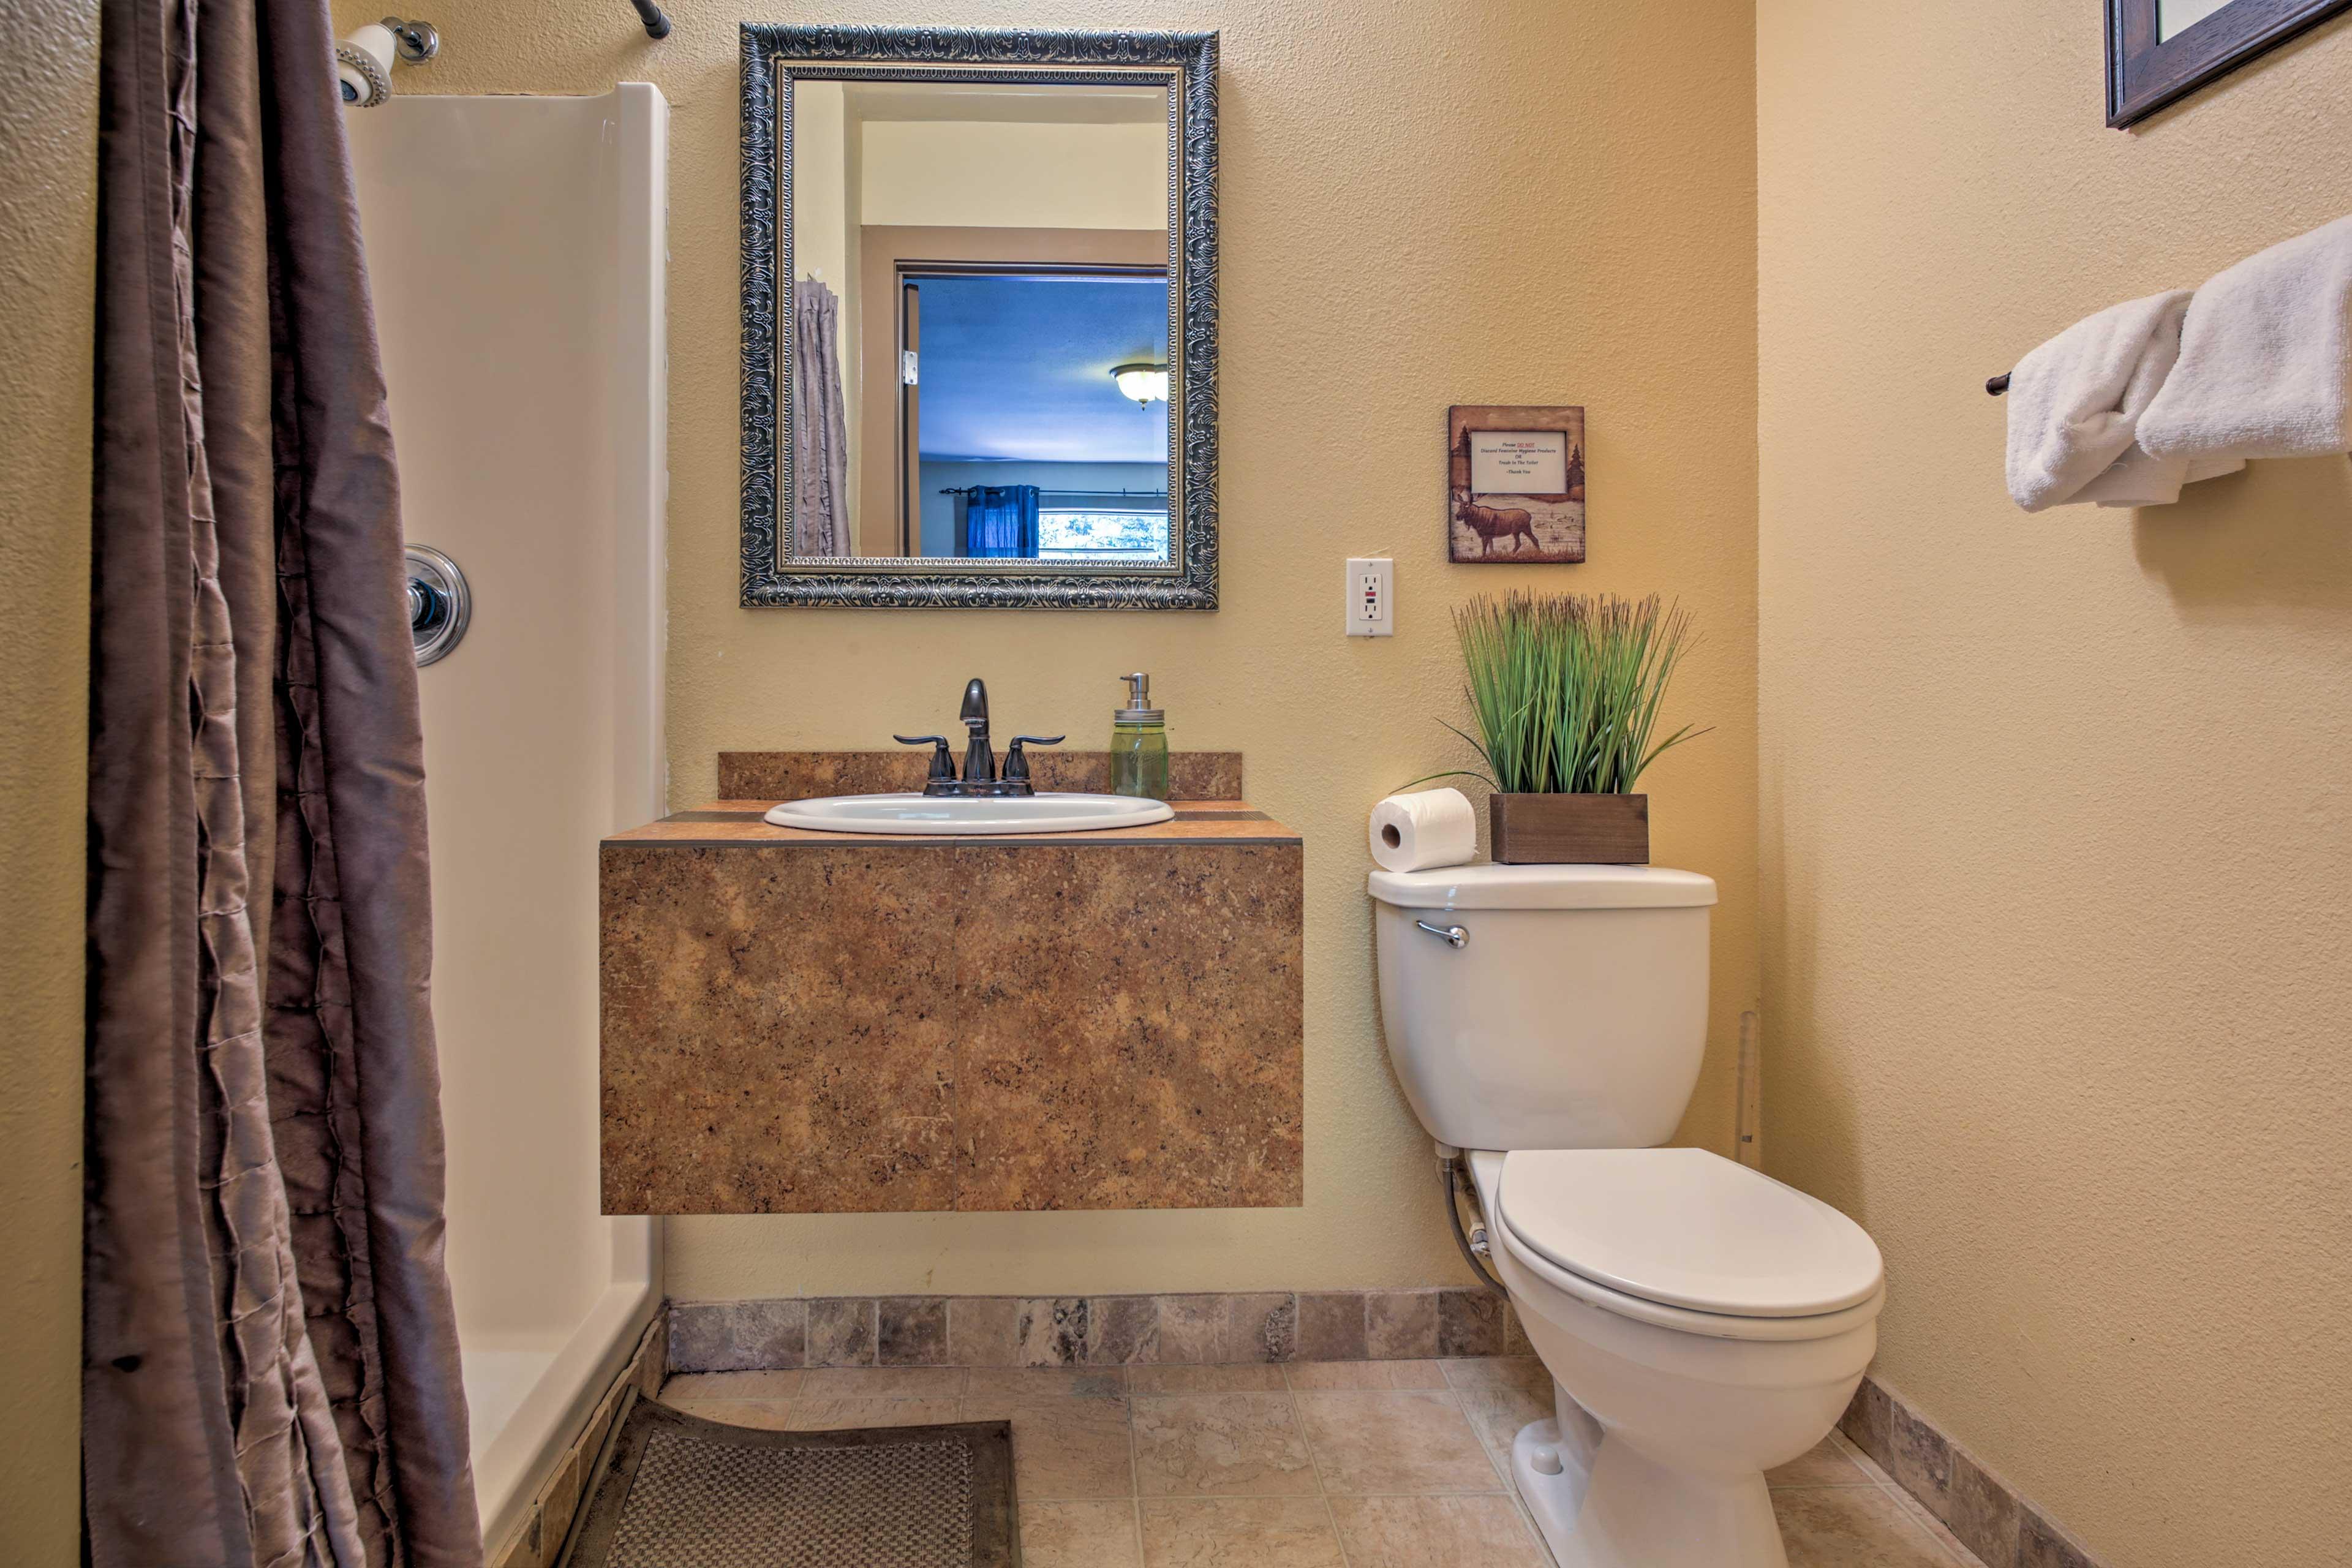 The en-suite full bathroom has a walk-in shower.